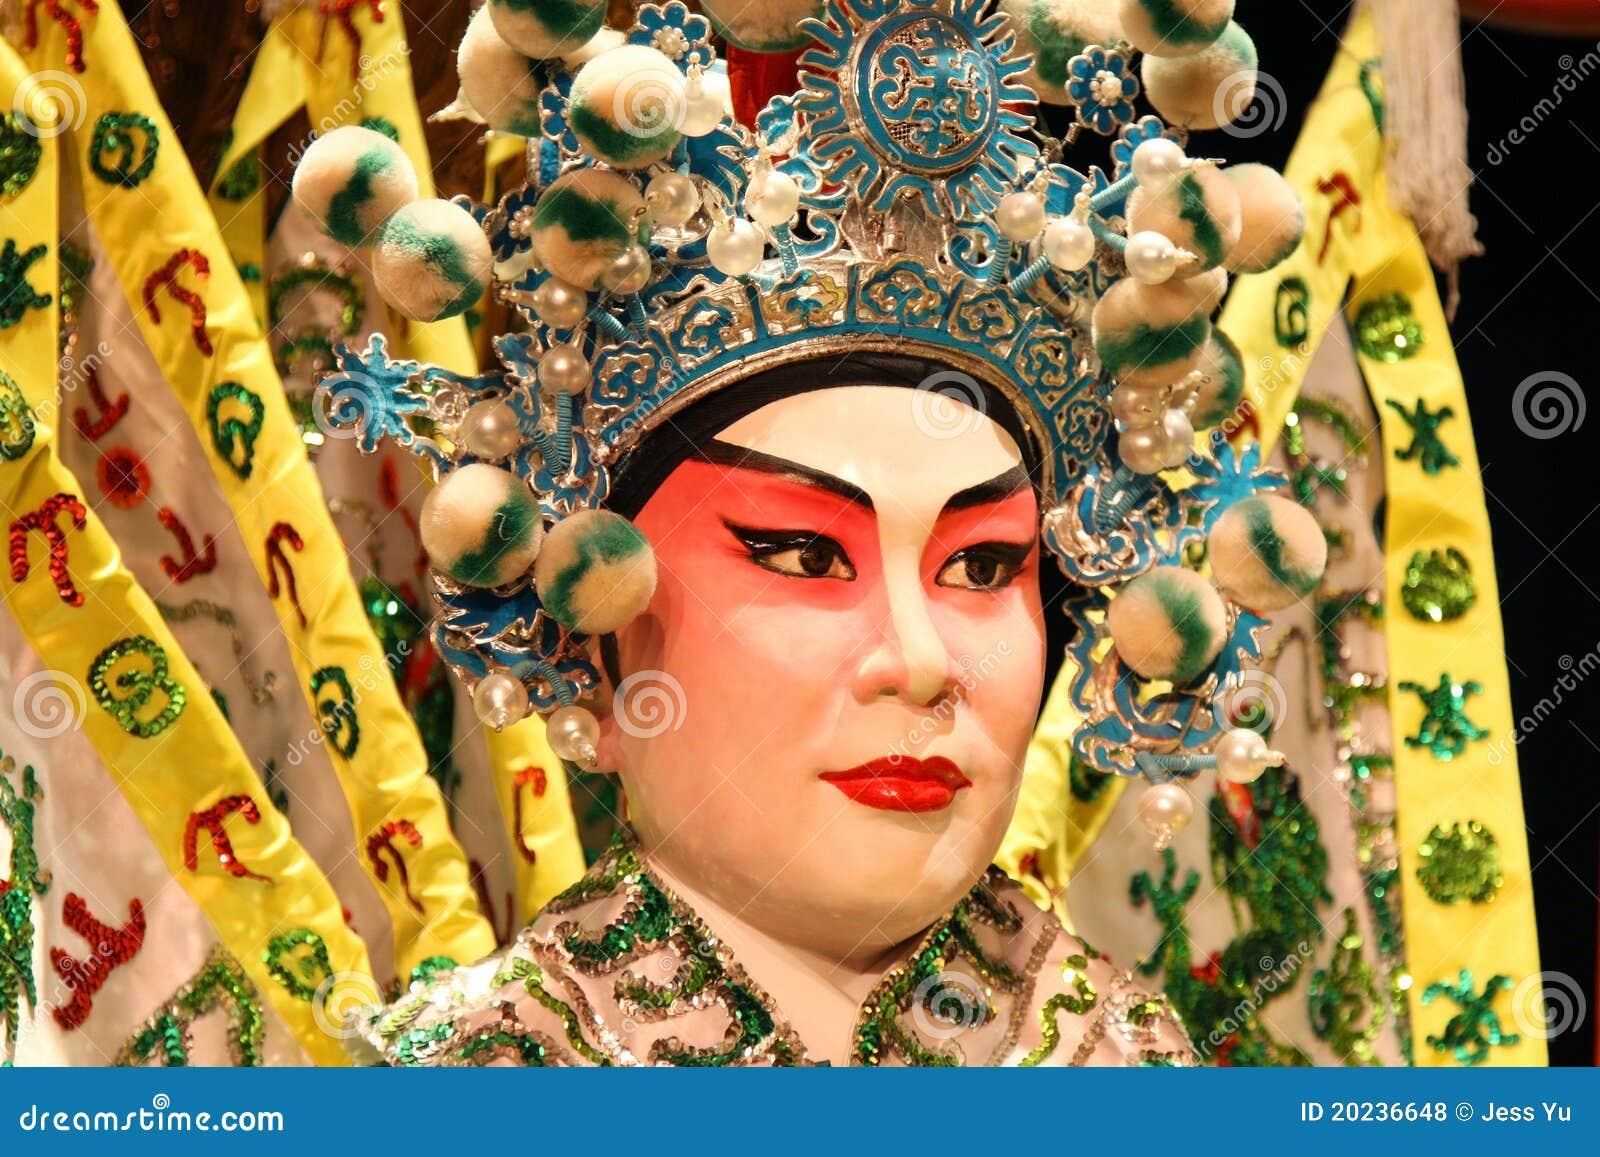 Cantonese opera dummy close-up.